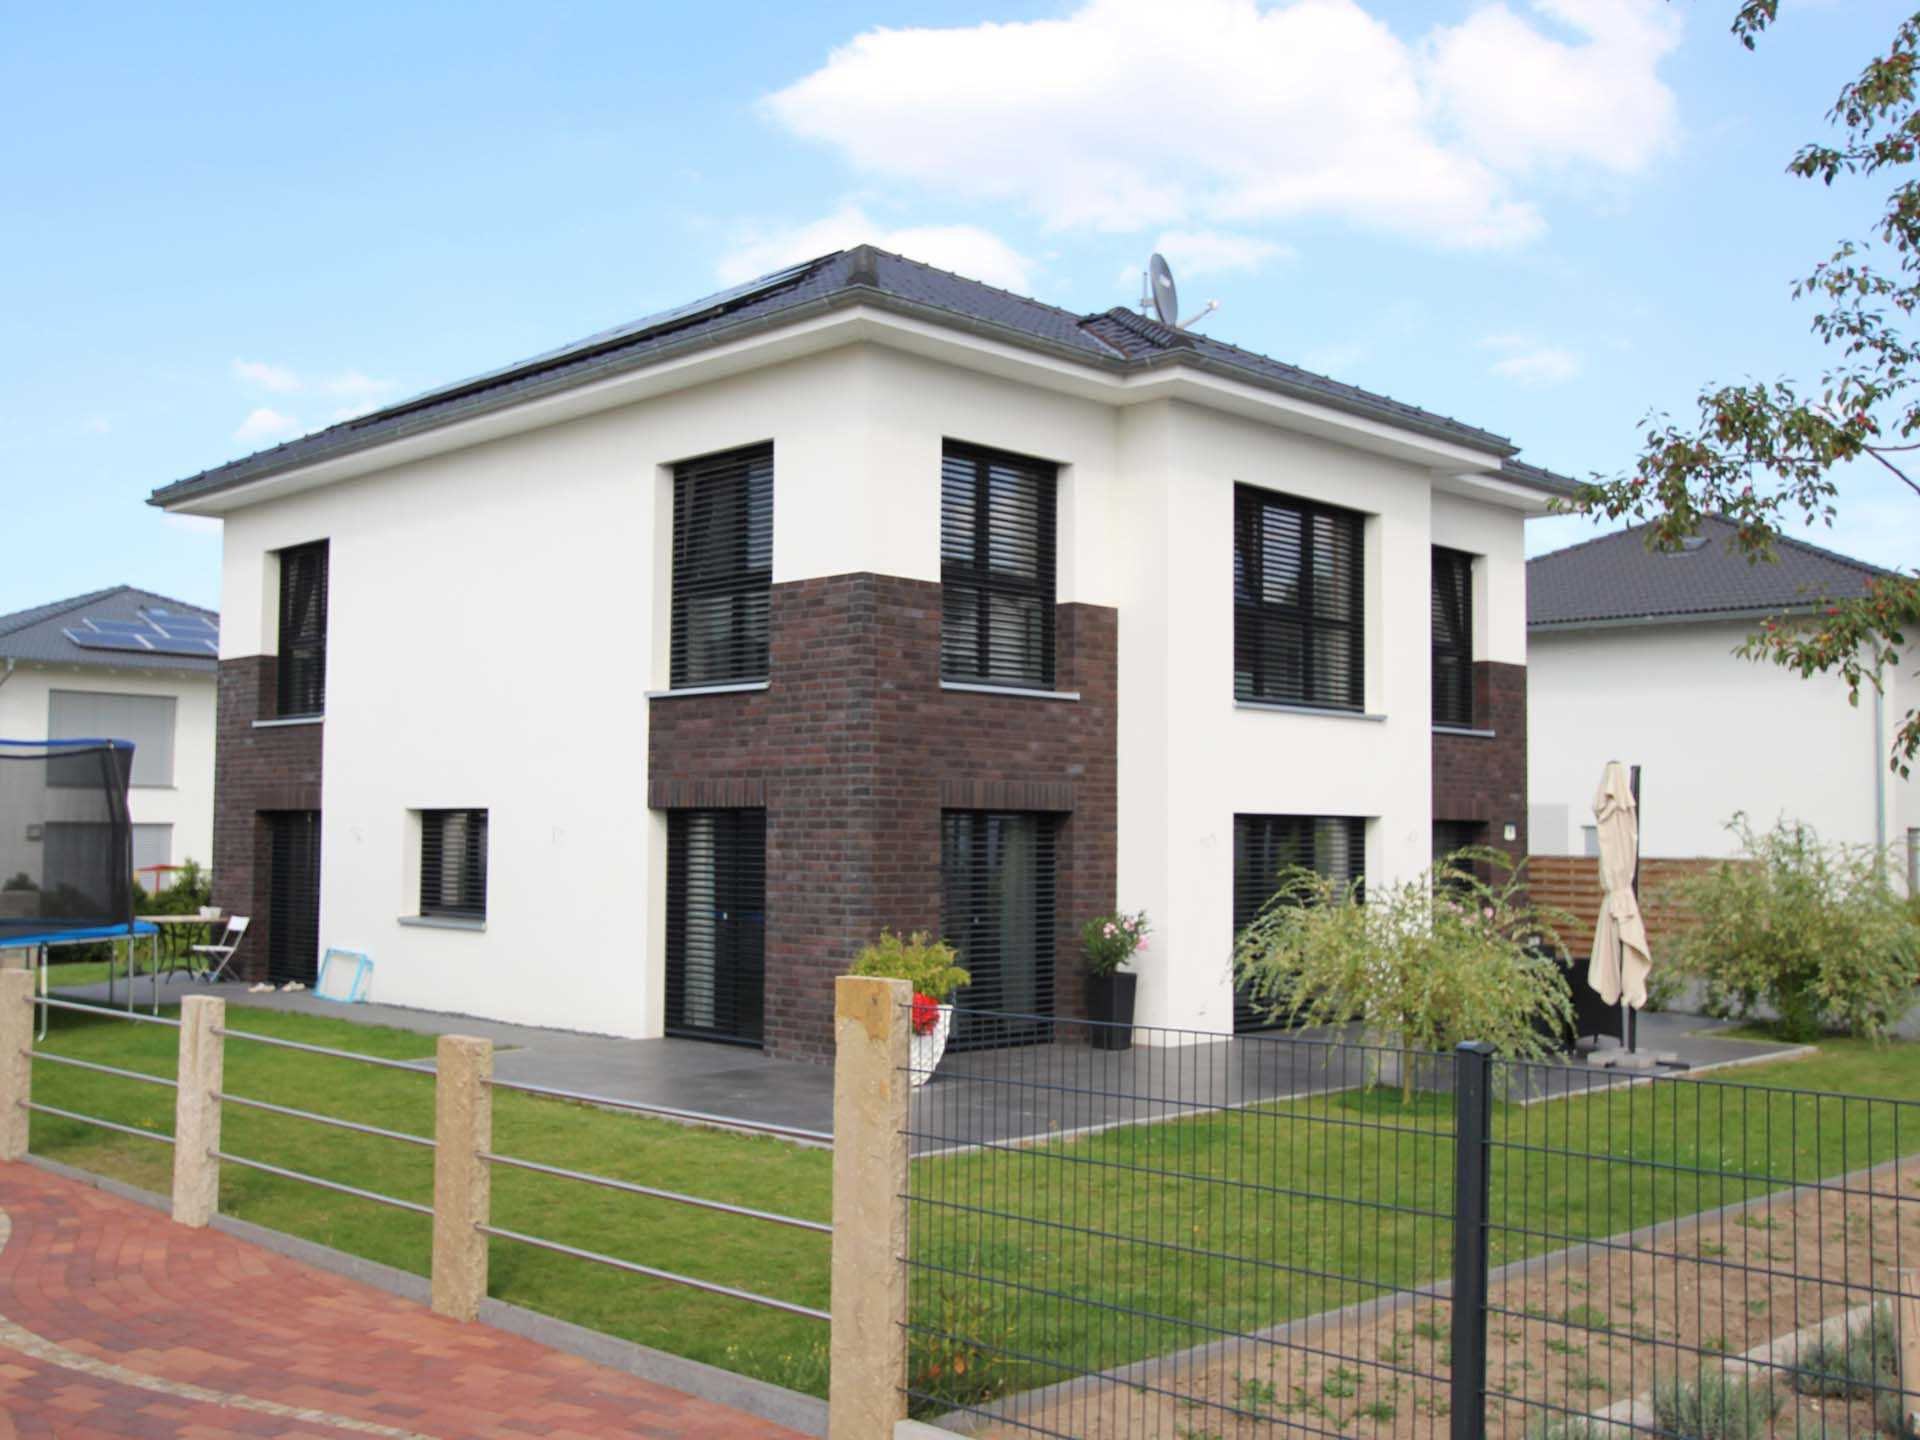 NURDA-Hausbau Stadthaus